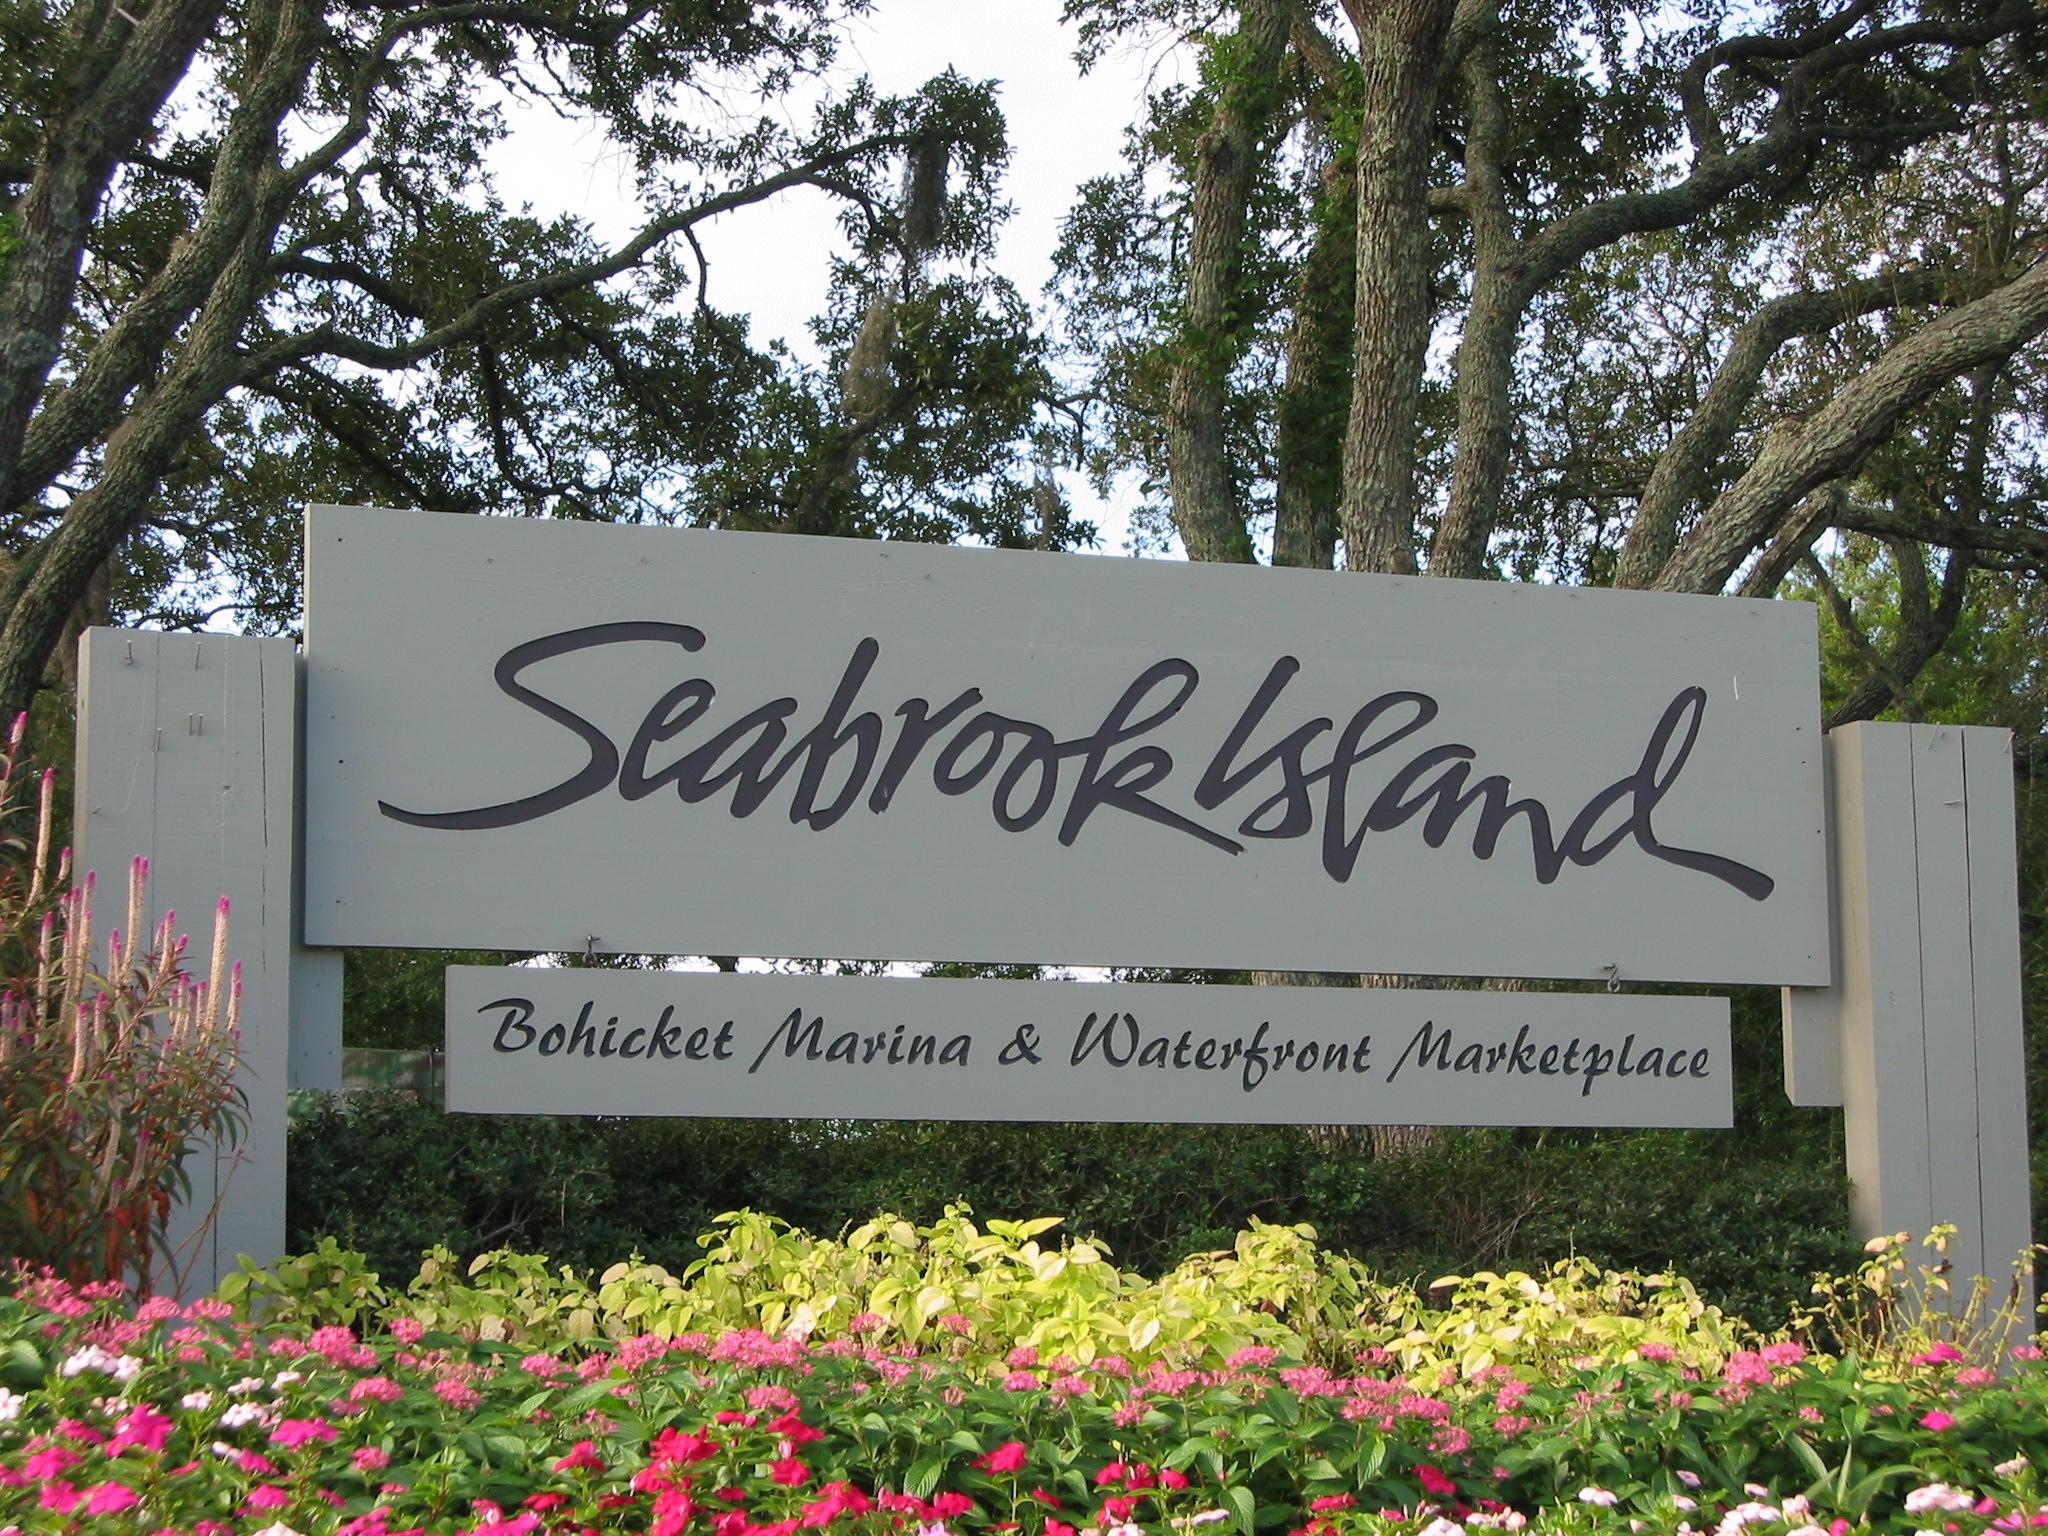 3009 Seabrook Village Drive Seabrook Island, SC 29455